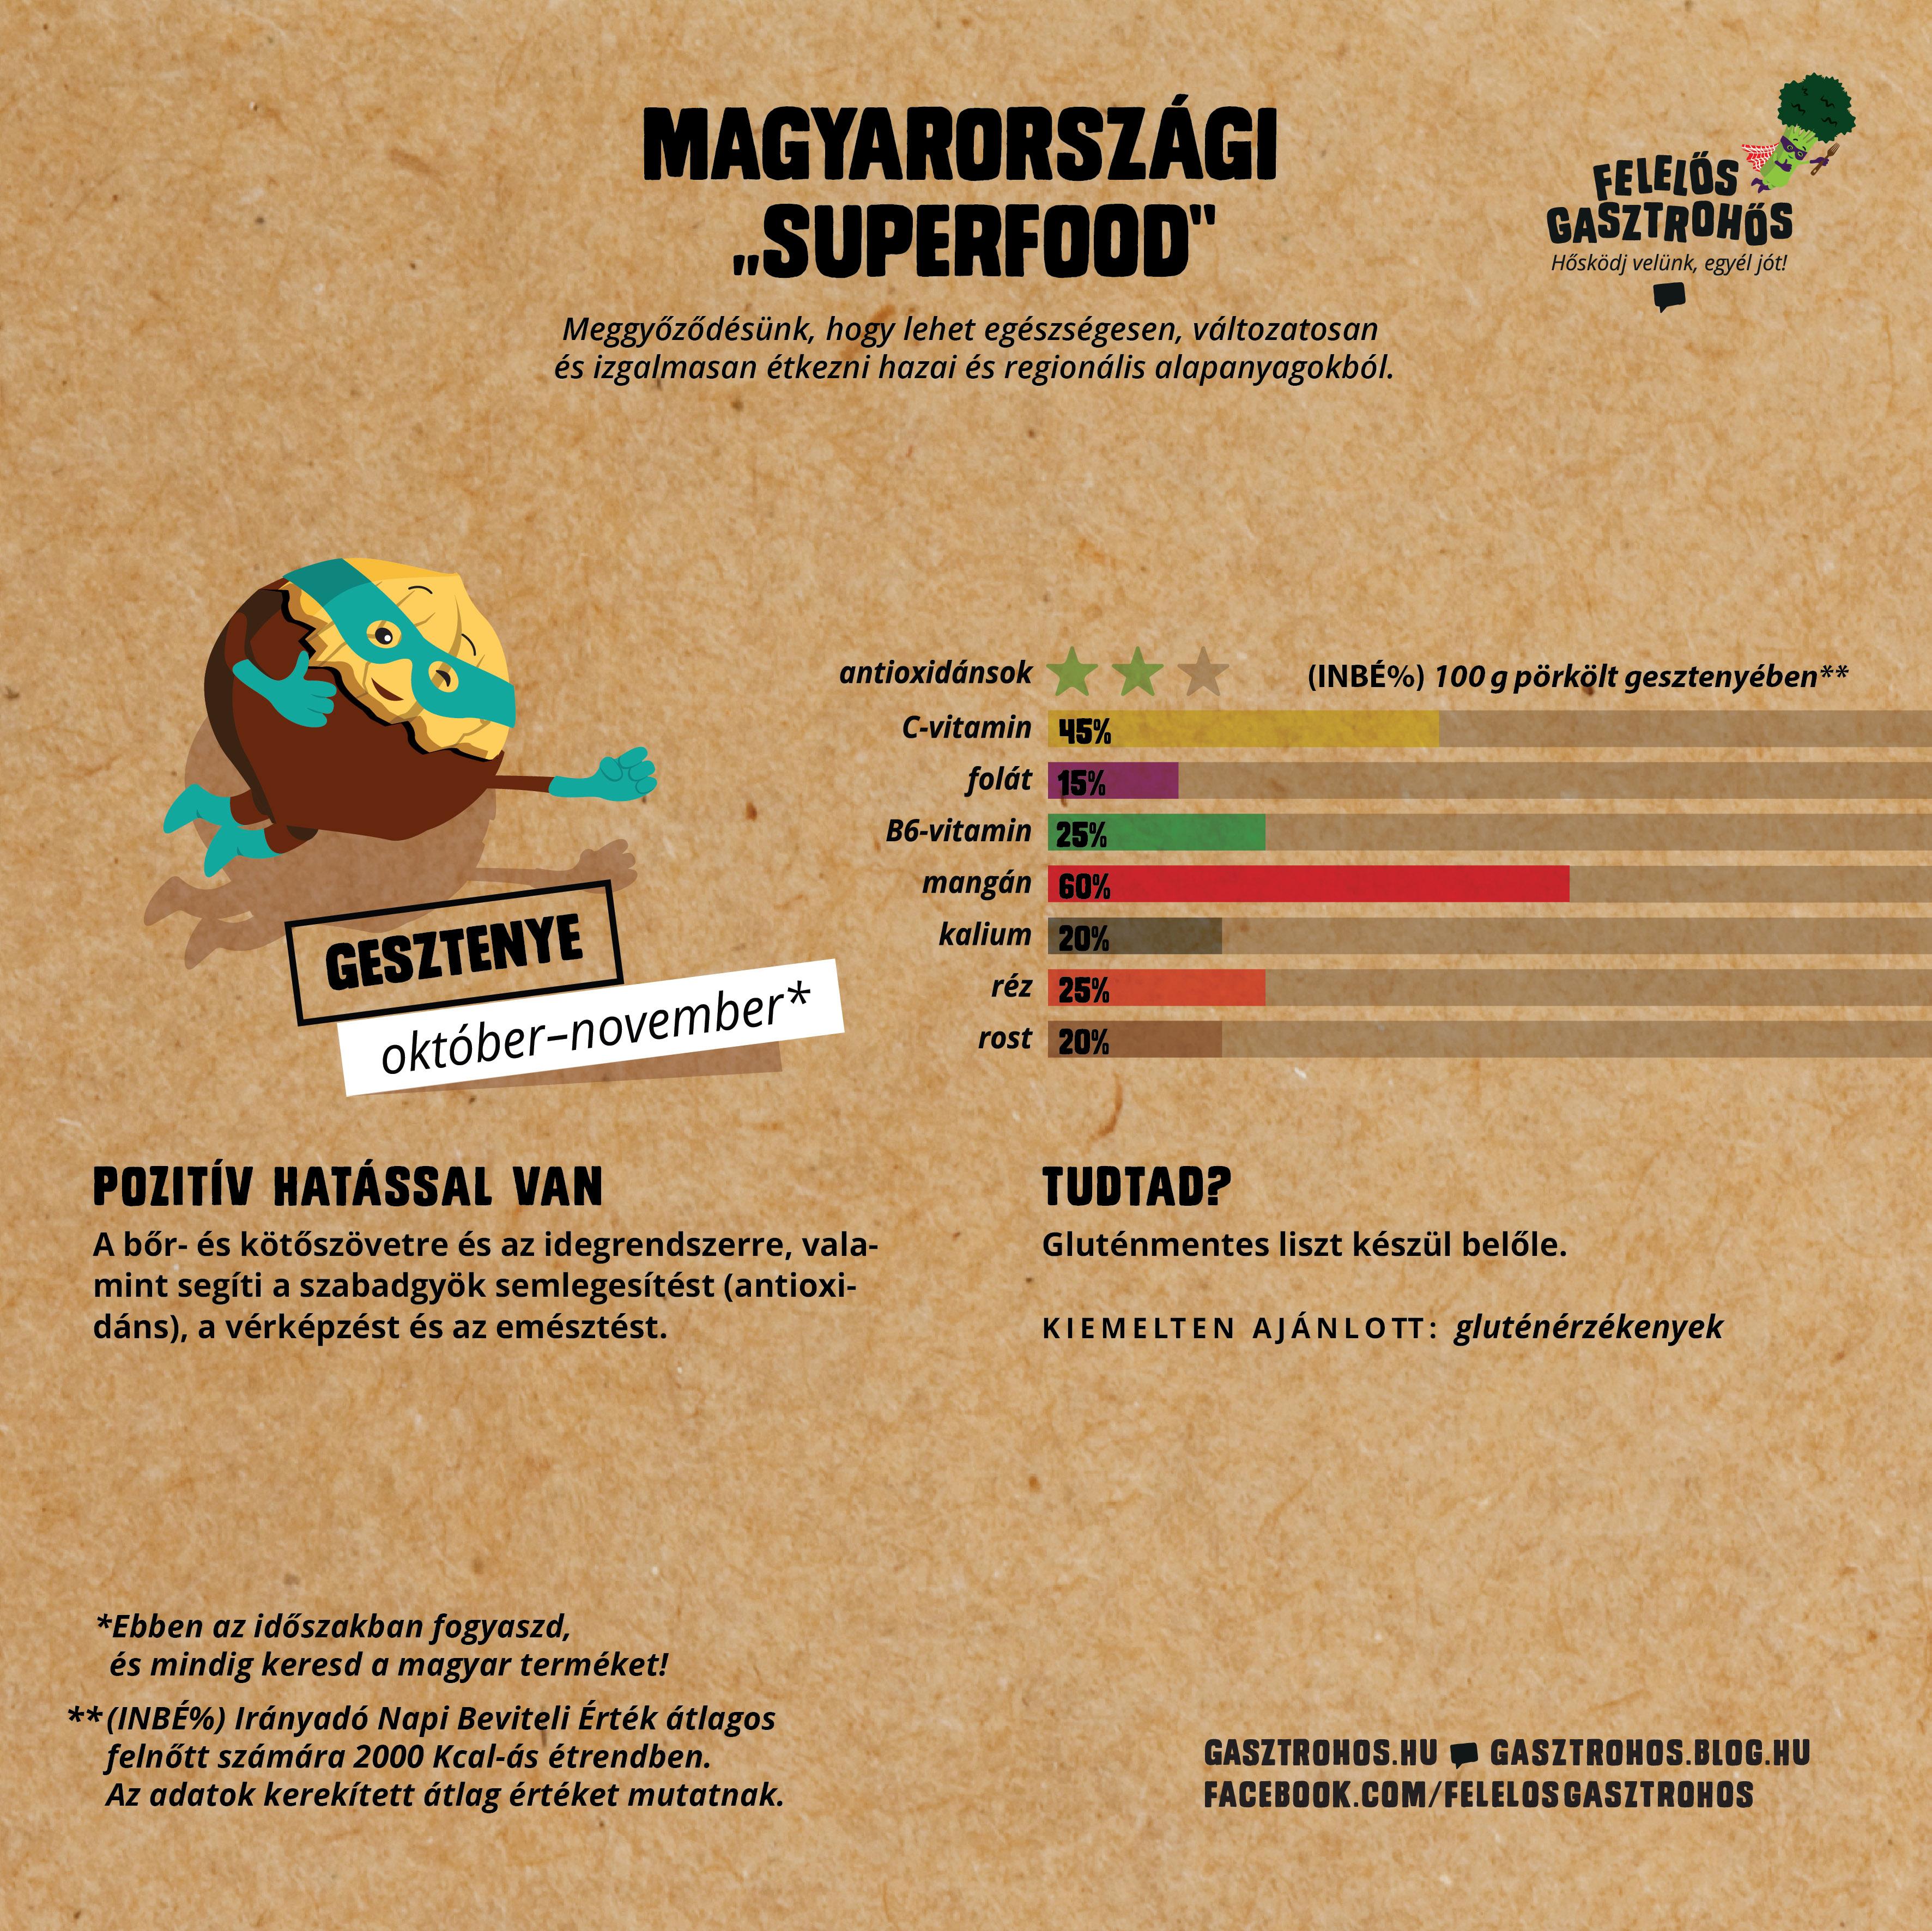 gasztrohos-superfood-terkep-infografika-2017-06-17-blog_2.jpg